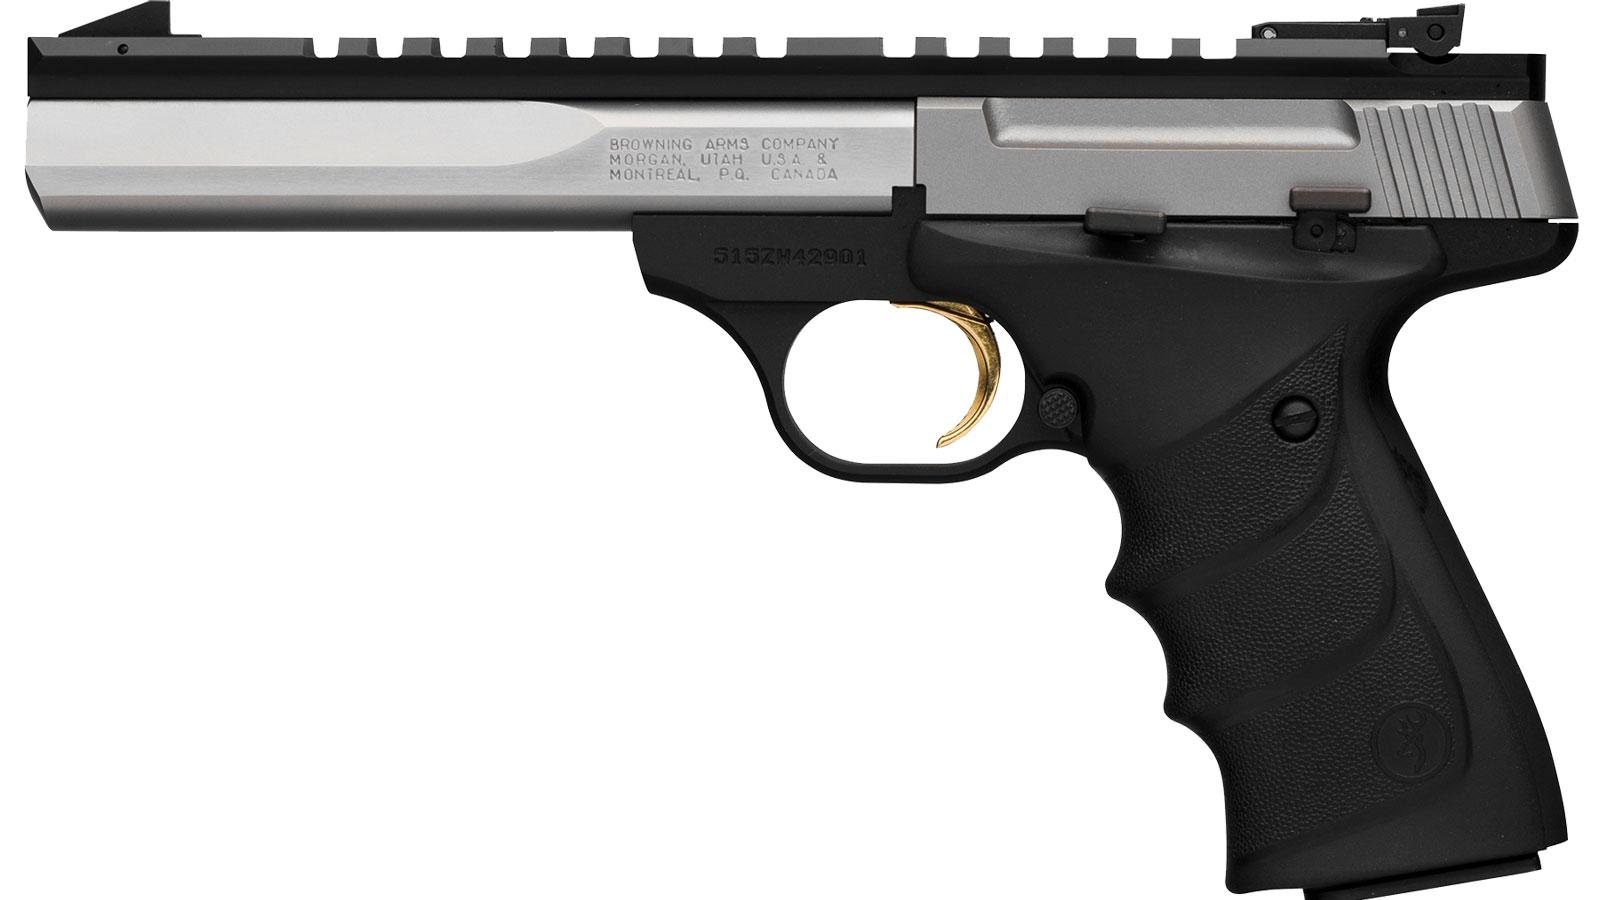 Browning 051507490 Buck Mark Contour 22 Long Rifle (LR) Single 5.5 10+1 Black Ultragrip RX Grip Black Aluminum Alloy Frame Stainless Slide in.